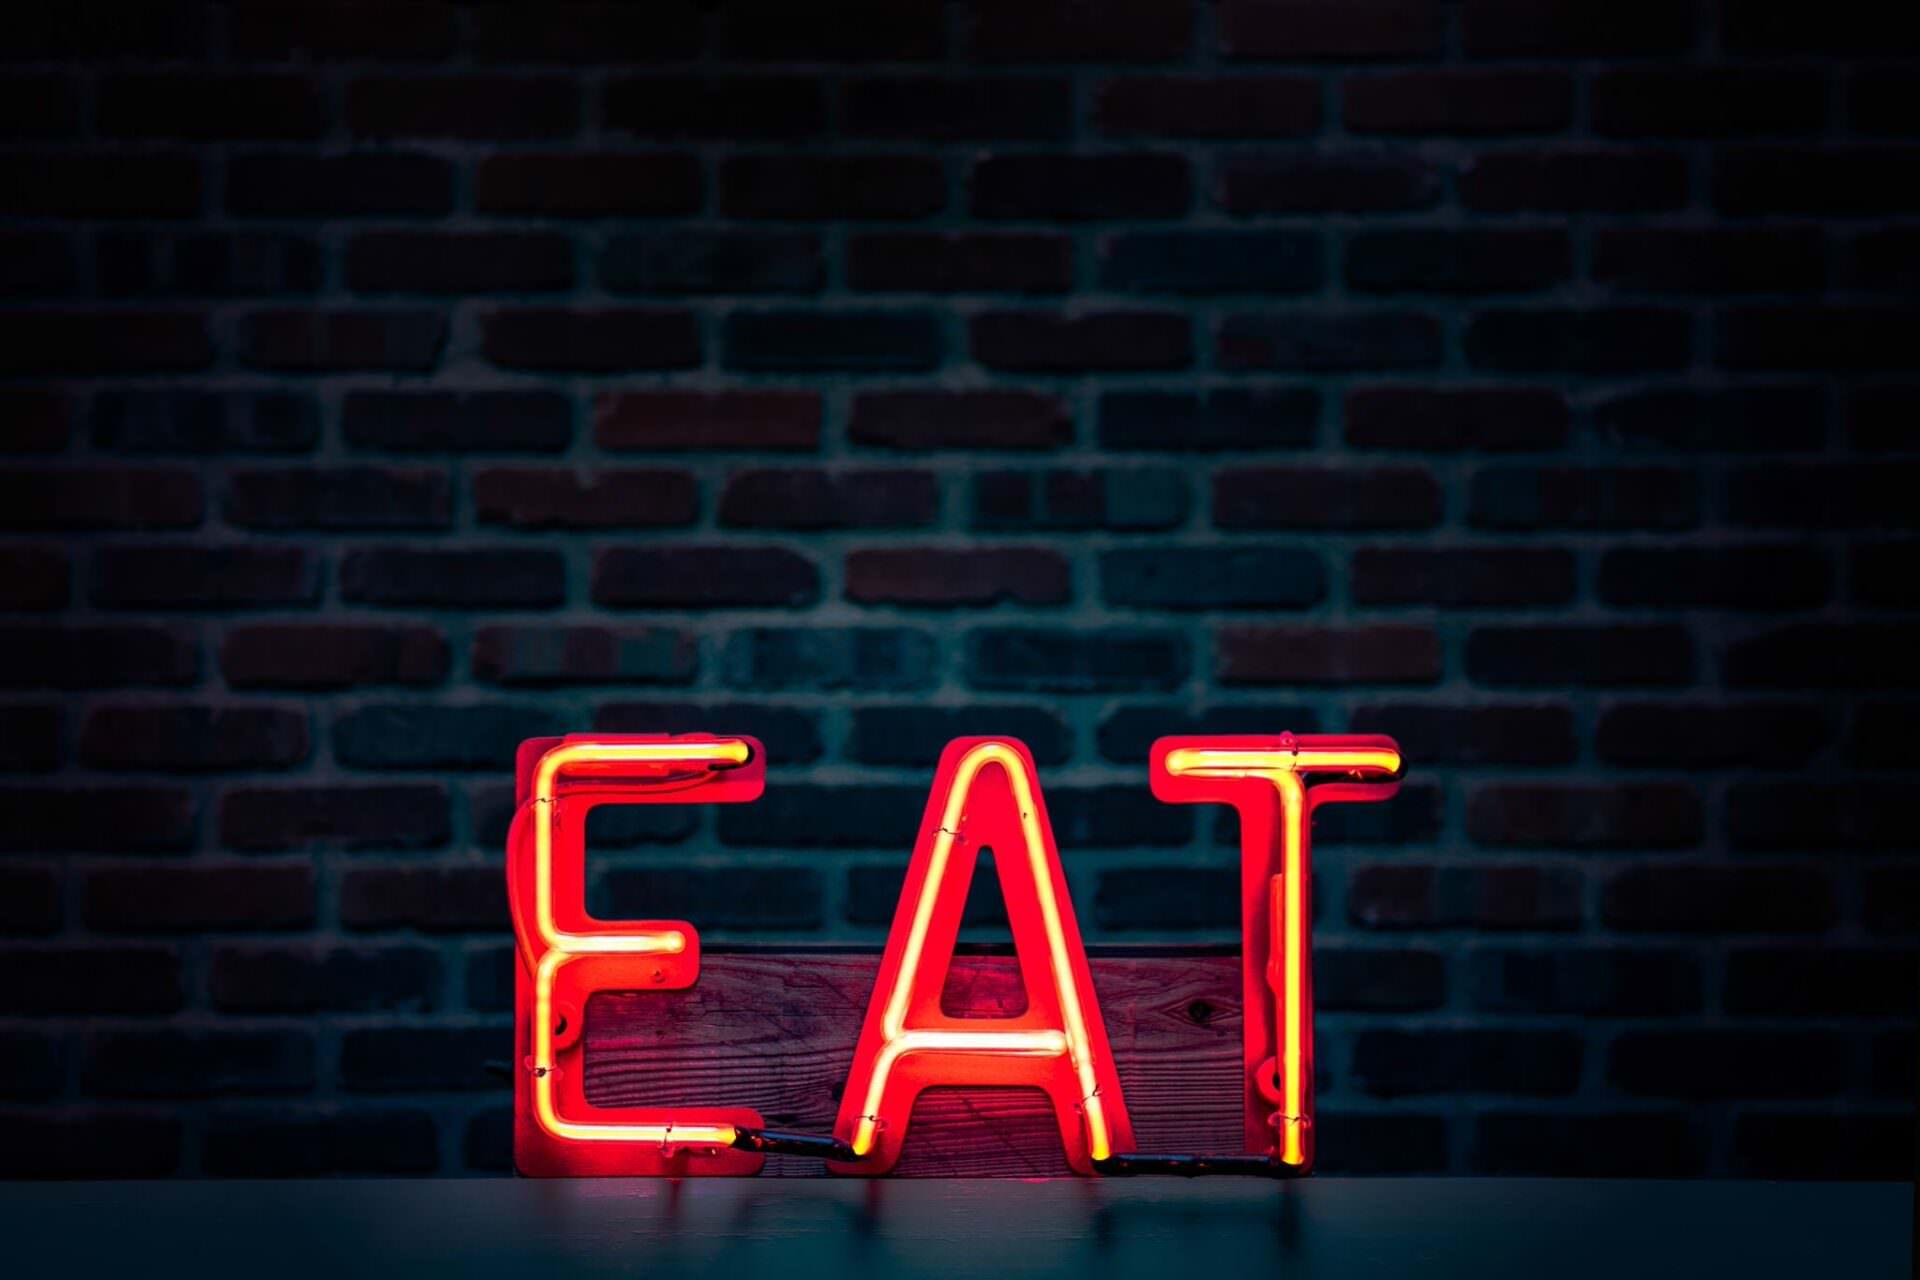 Google E-A-T – czy Google chce Cię zjeść?!